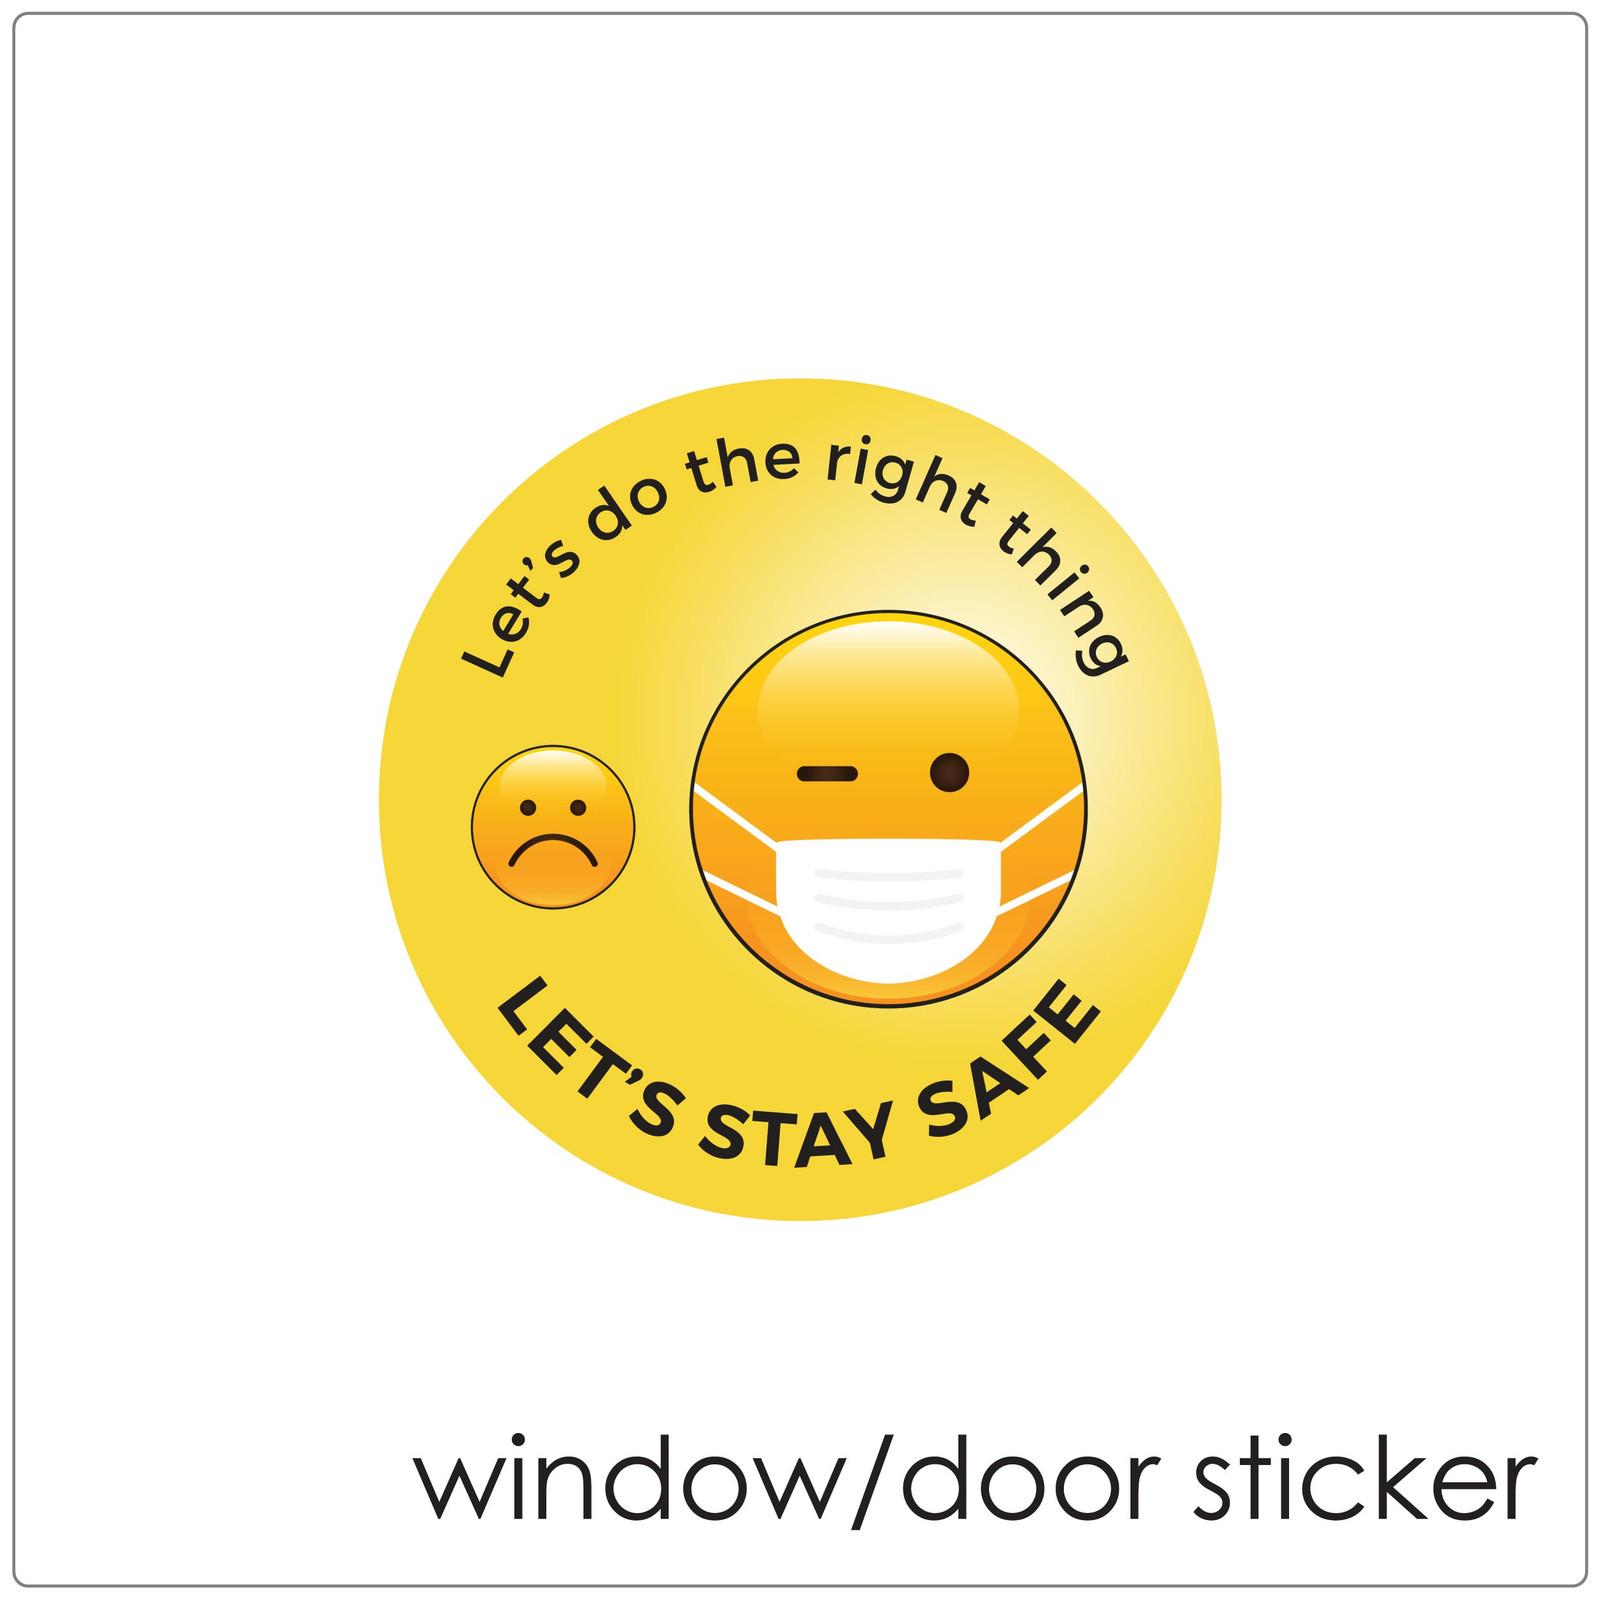 Face mask DOOR/WINDOW sticker, emoji Self-adhesive covid mask sign to encourage mask wearing.